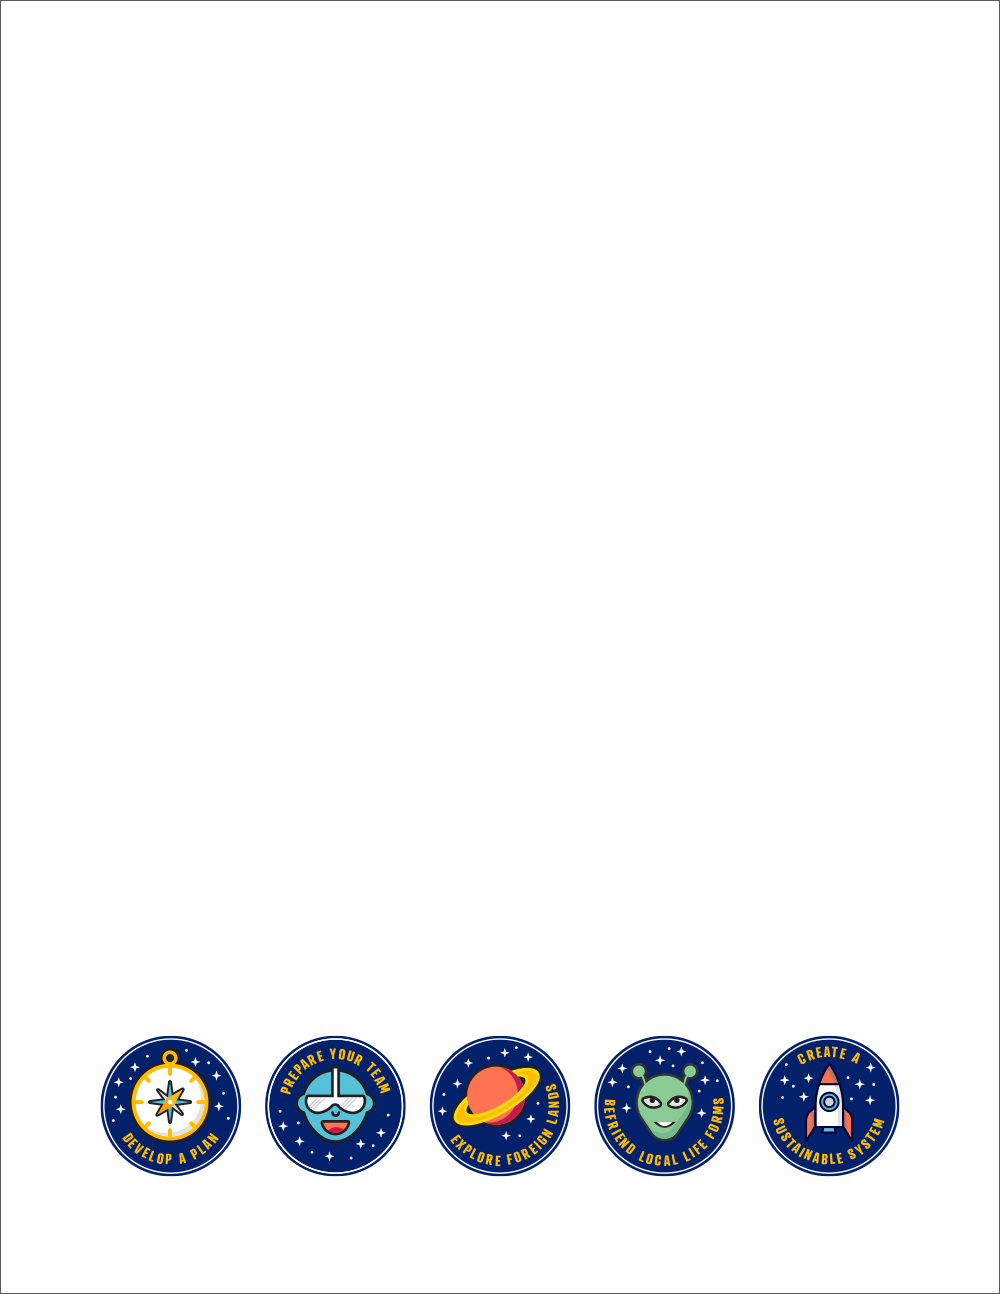 MNA-GuideToTheGalaxy-Workbook-36.jpg